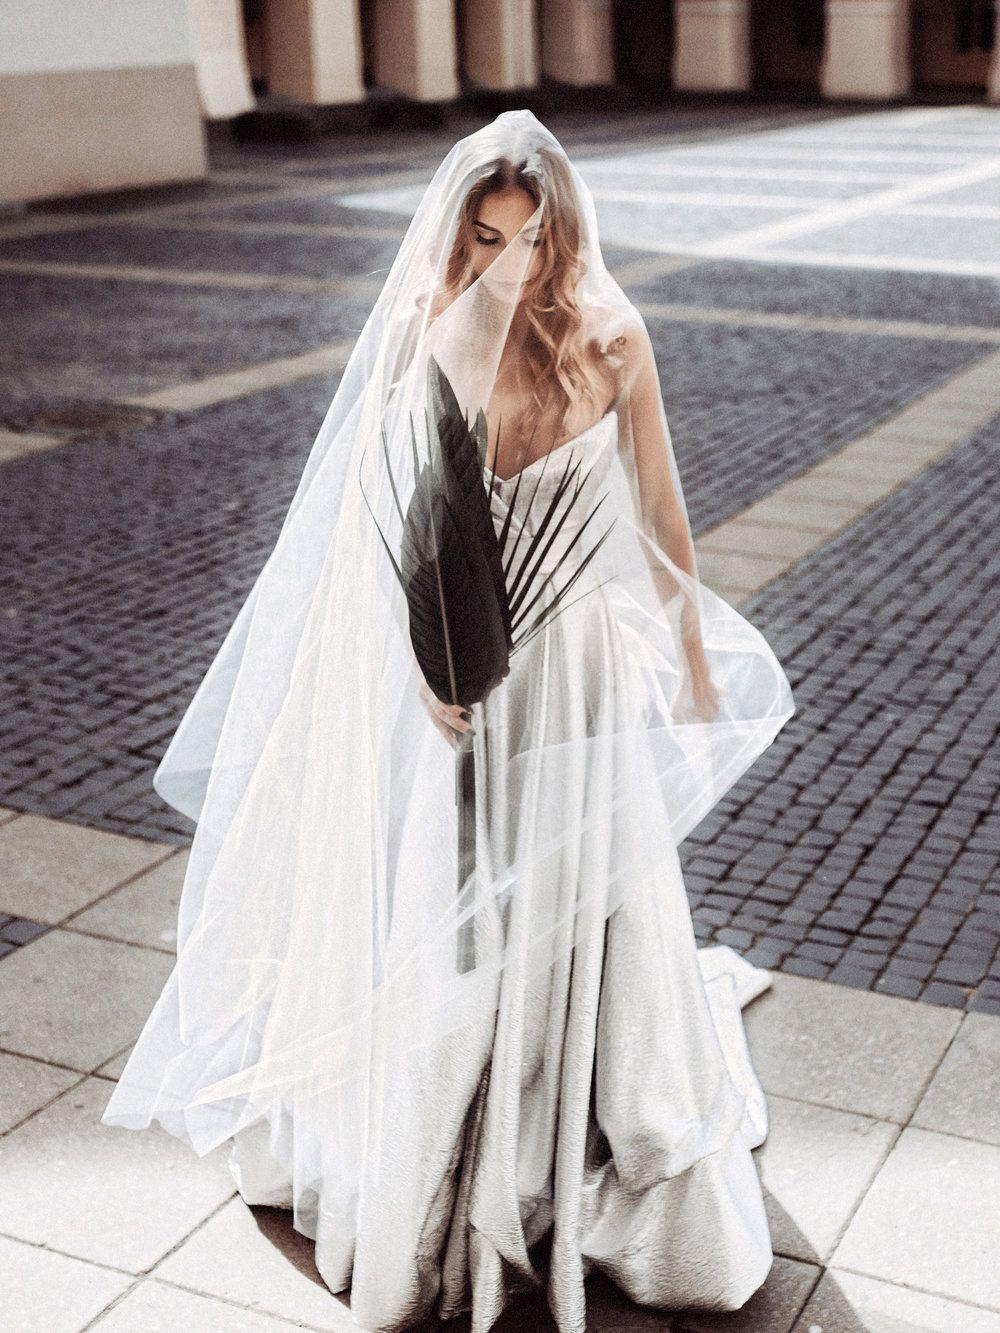 Fashion week Veiled US designer dreams of alternative fashion for girls